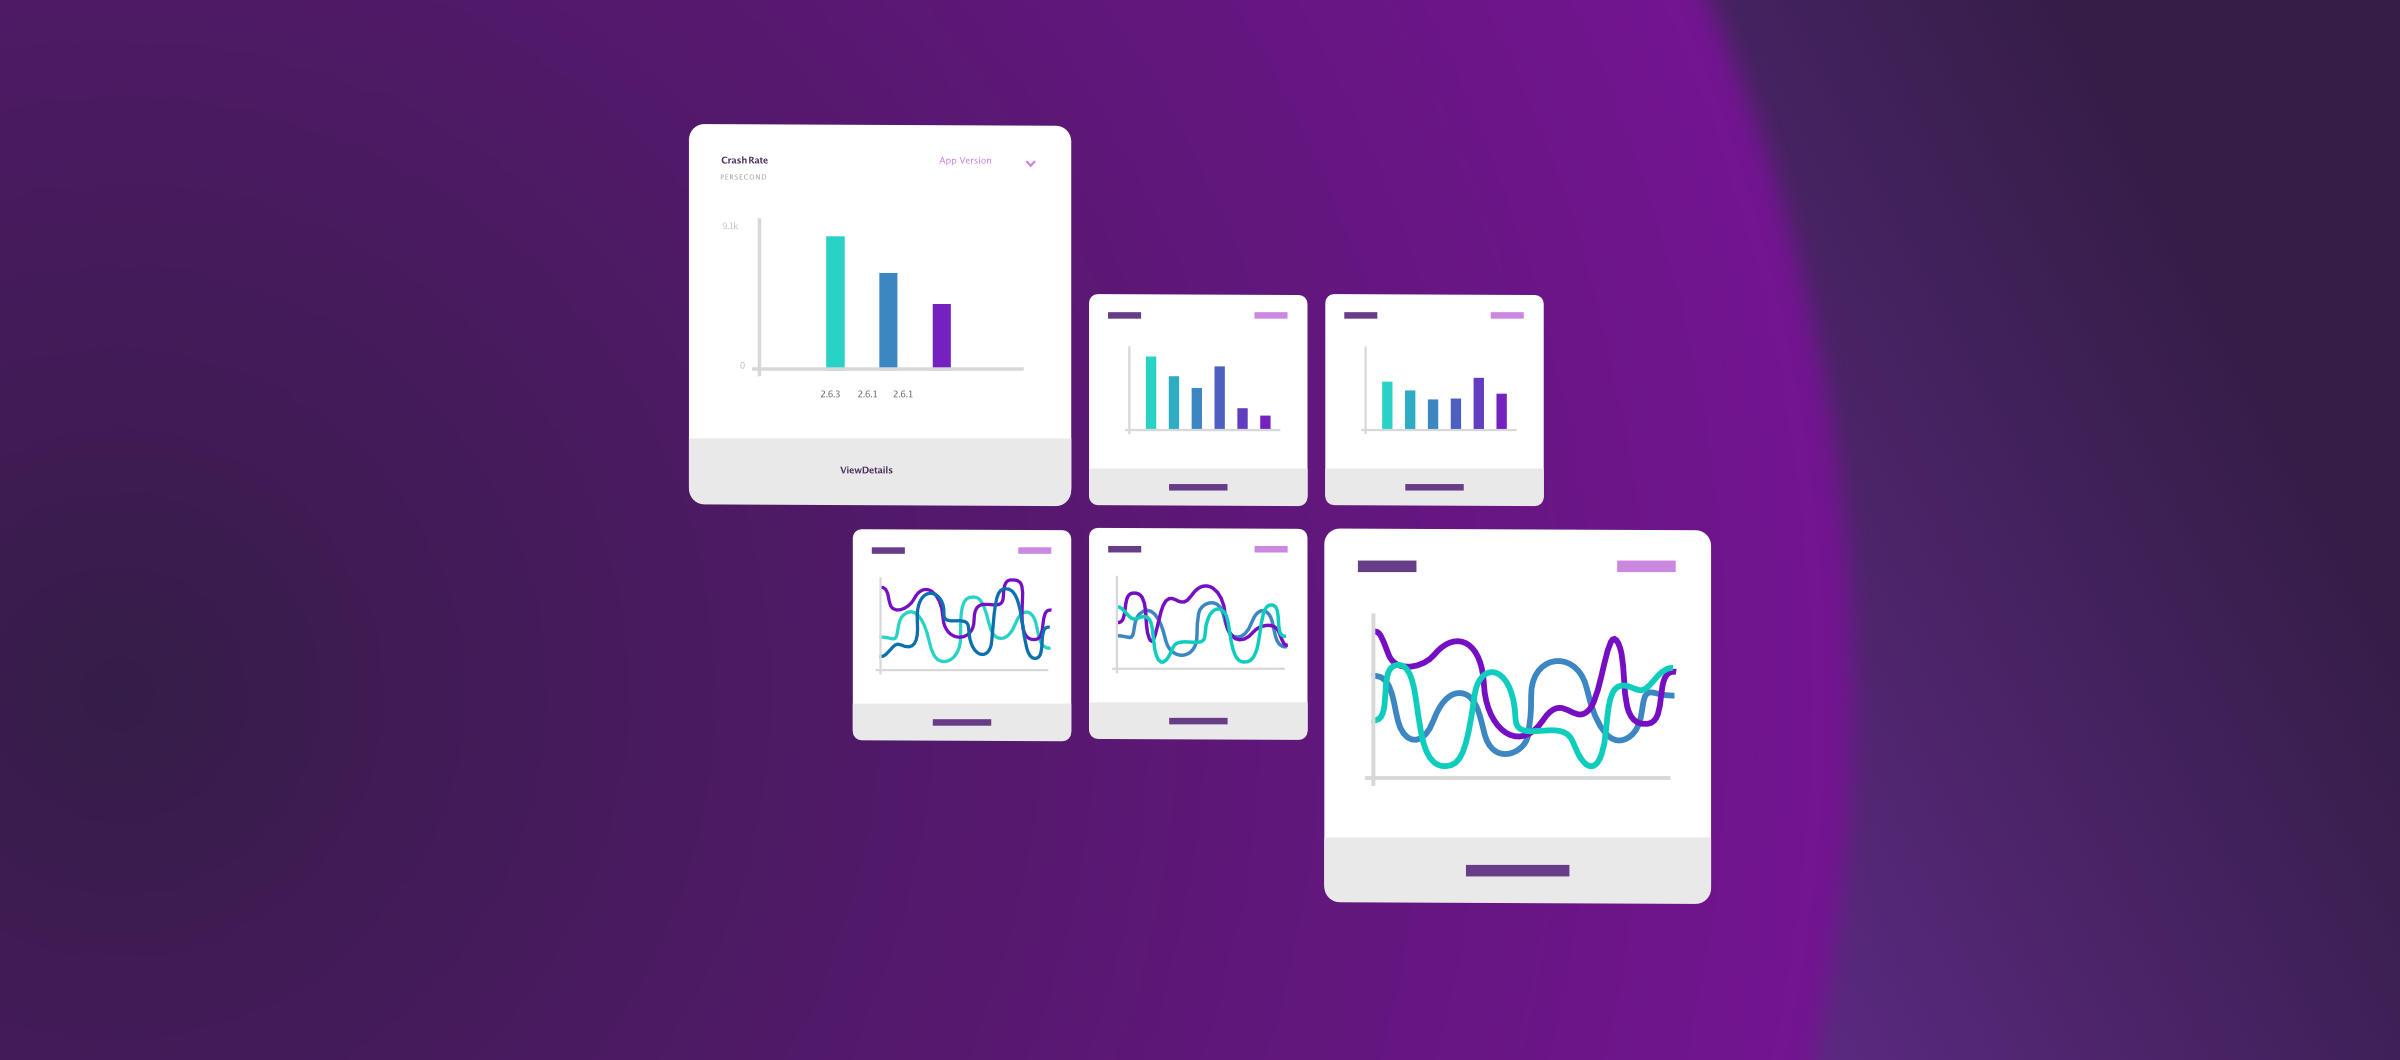 Build InsightsでBitriseのパフォーマンスを監視・向上しよう